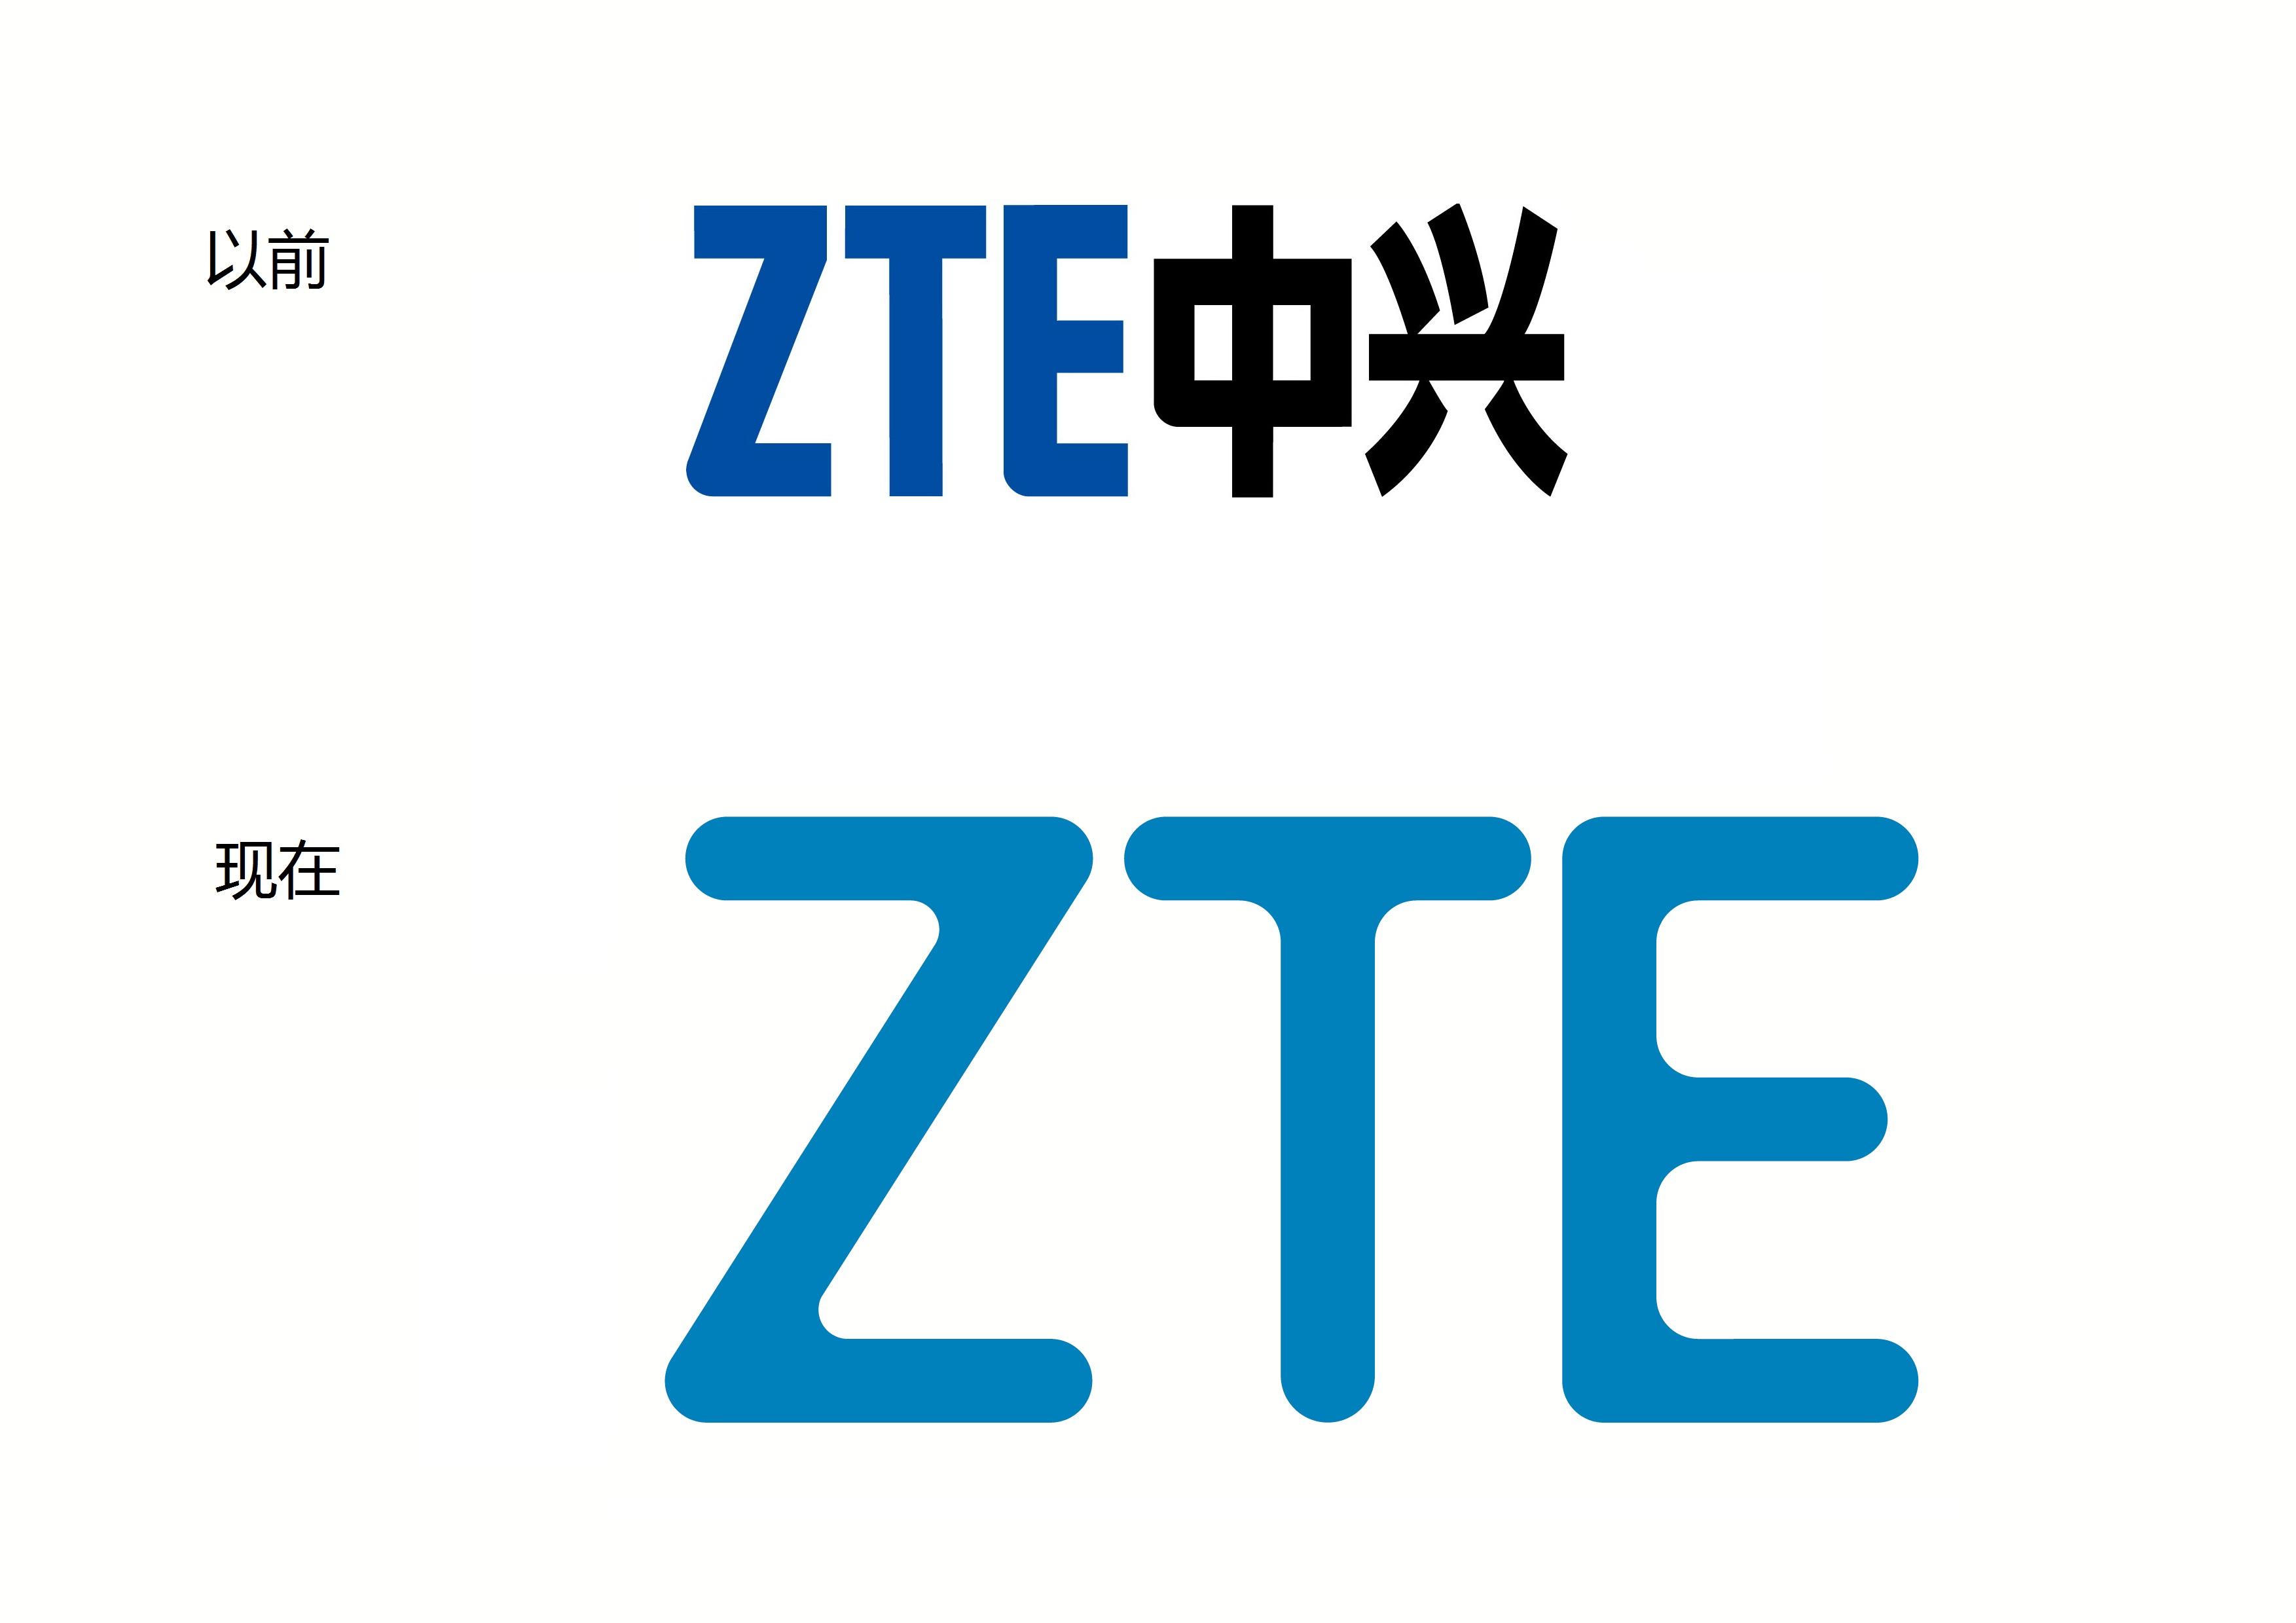 logo logo 标志 设计 图标 3507_2479